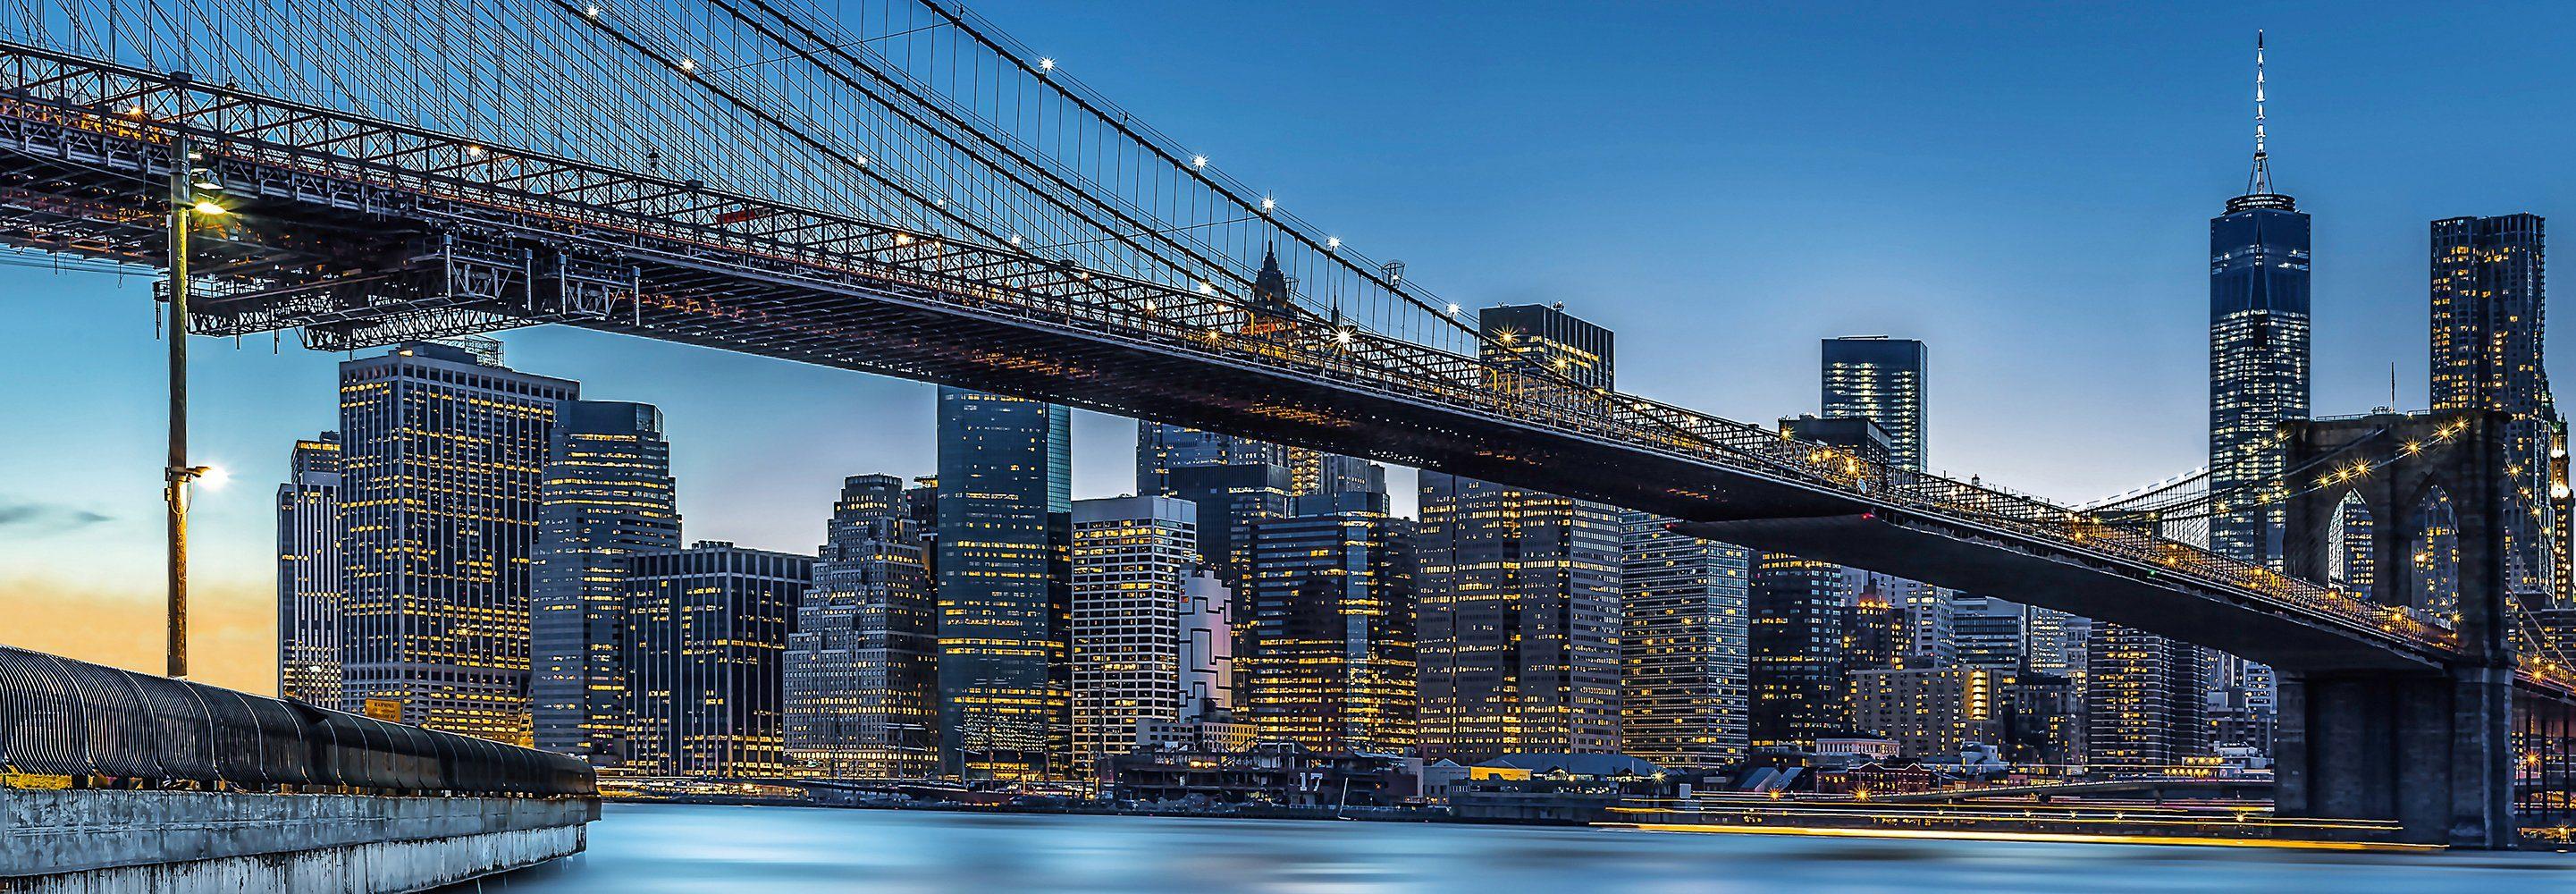 Vliestapete »Blue Hour over New York«, 366x127cm, 4-teilig